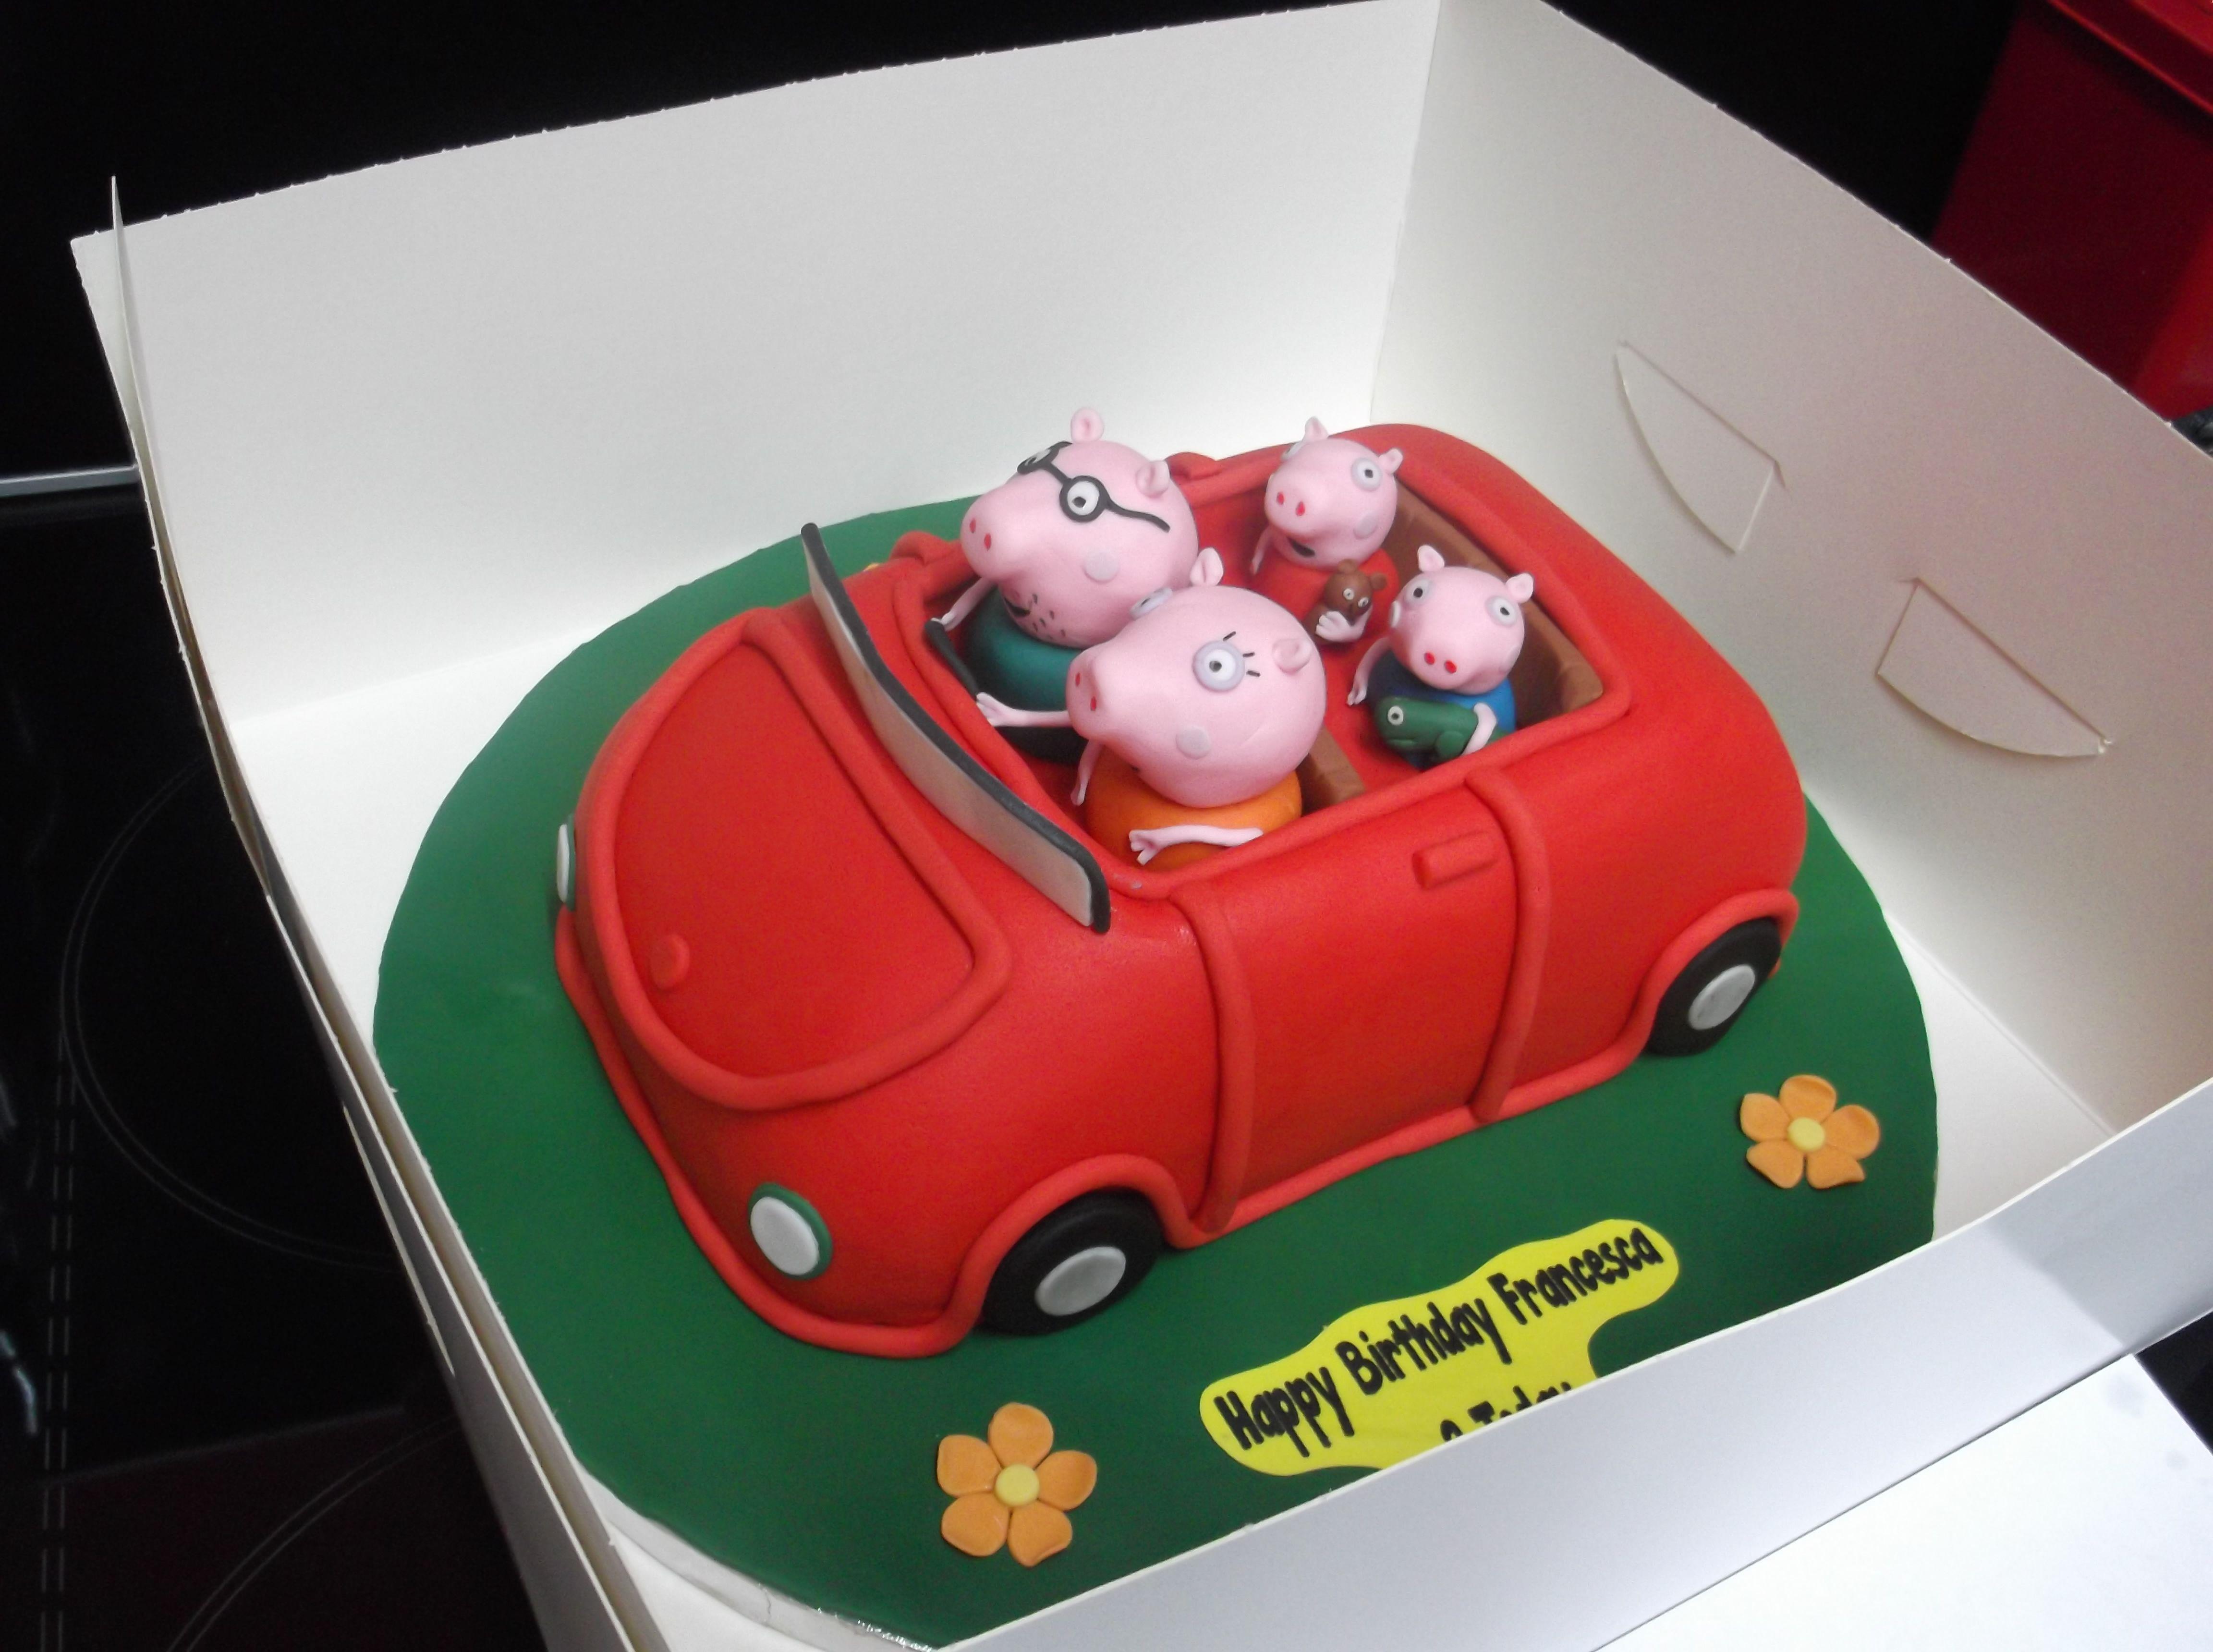 Peppa Pig Car Peppa Pig Car All Edible Figures Made From Fondant